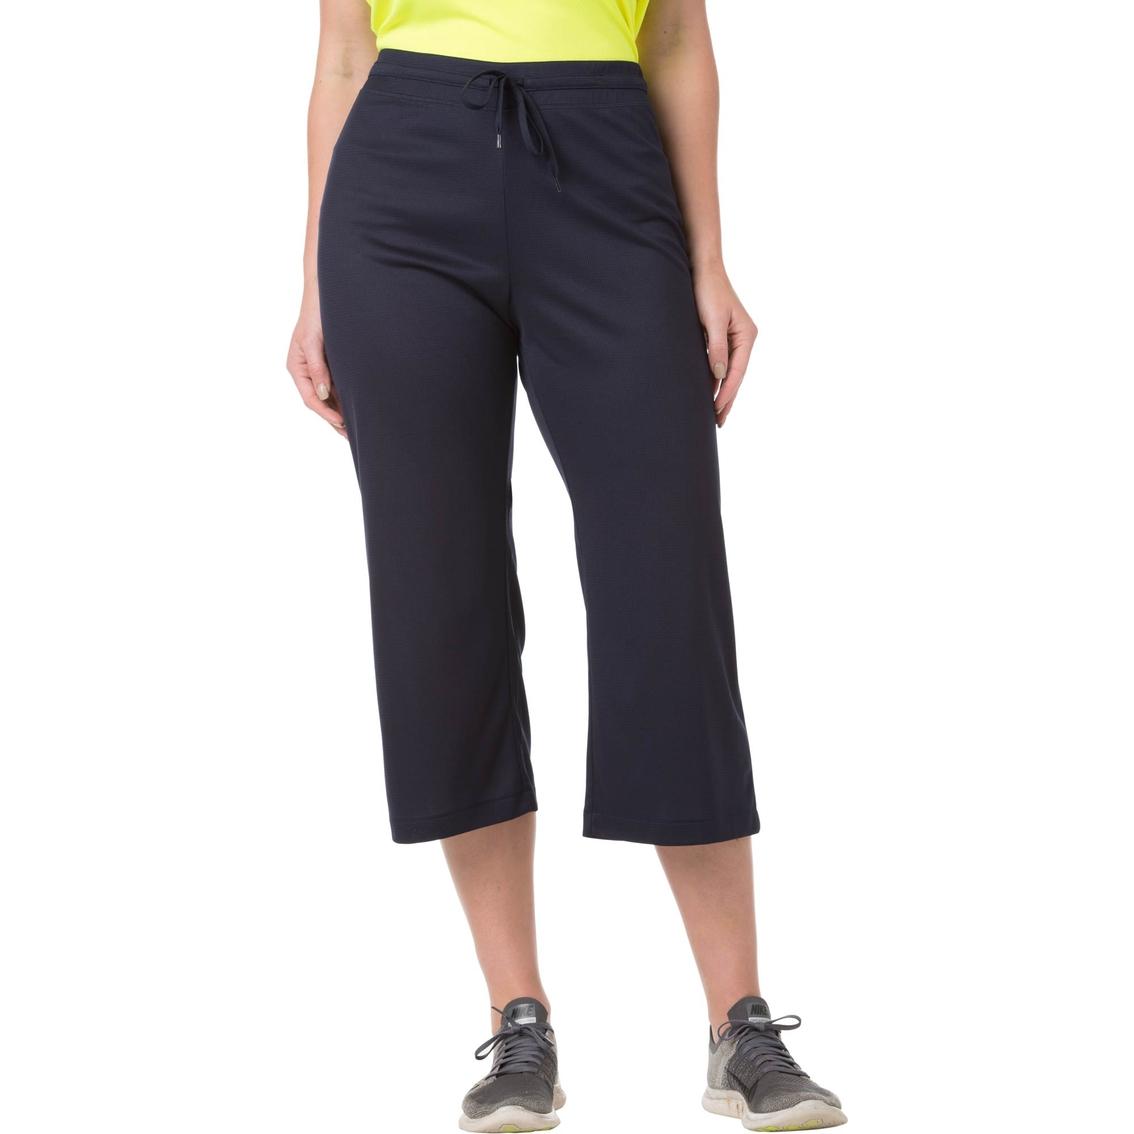 Plus Size Clothing | Plus Size Women's Clothing | ASOS